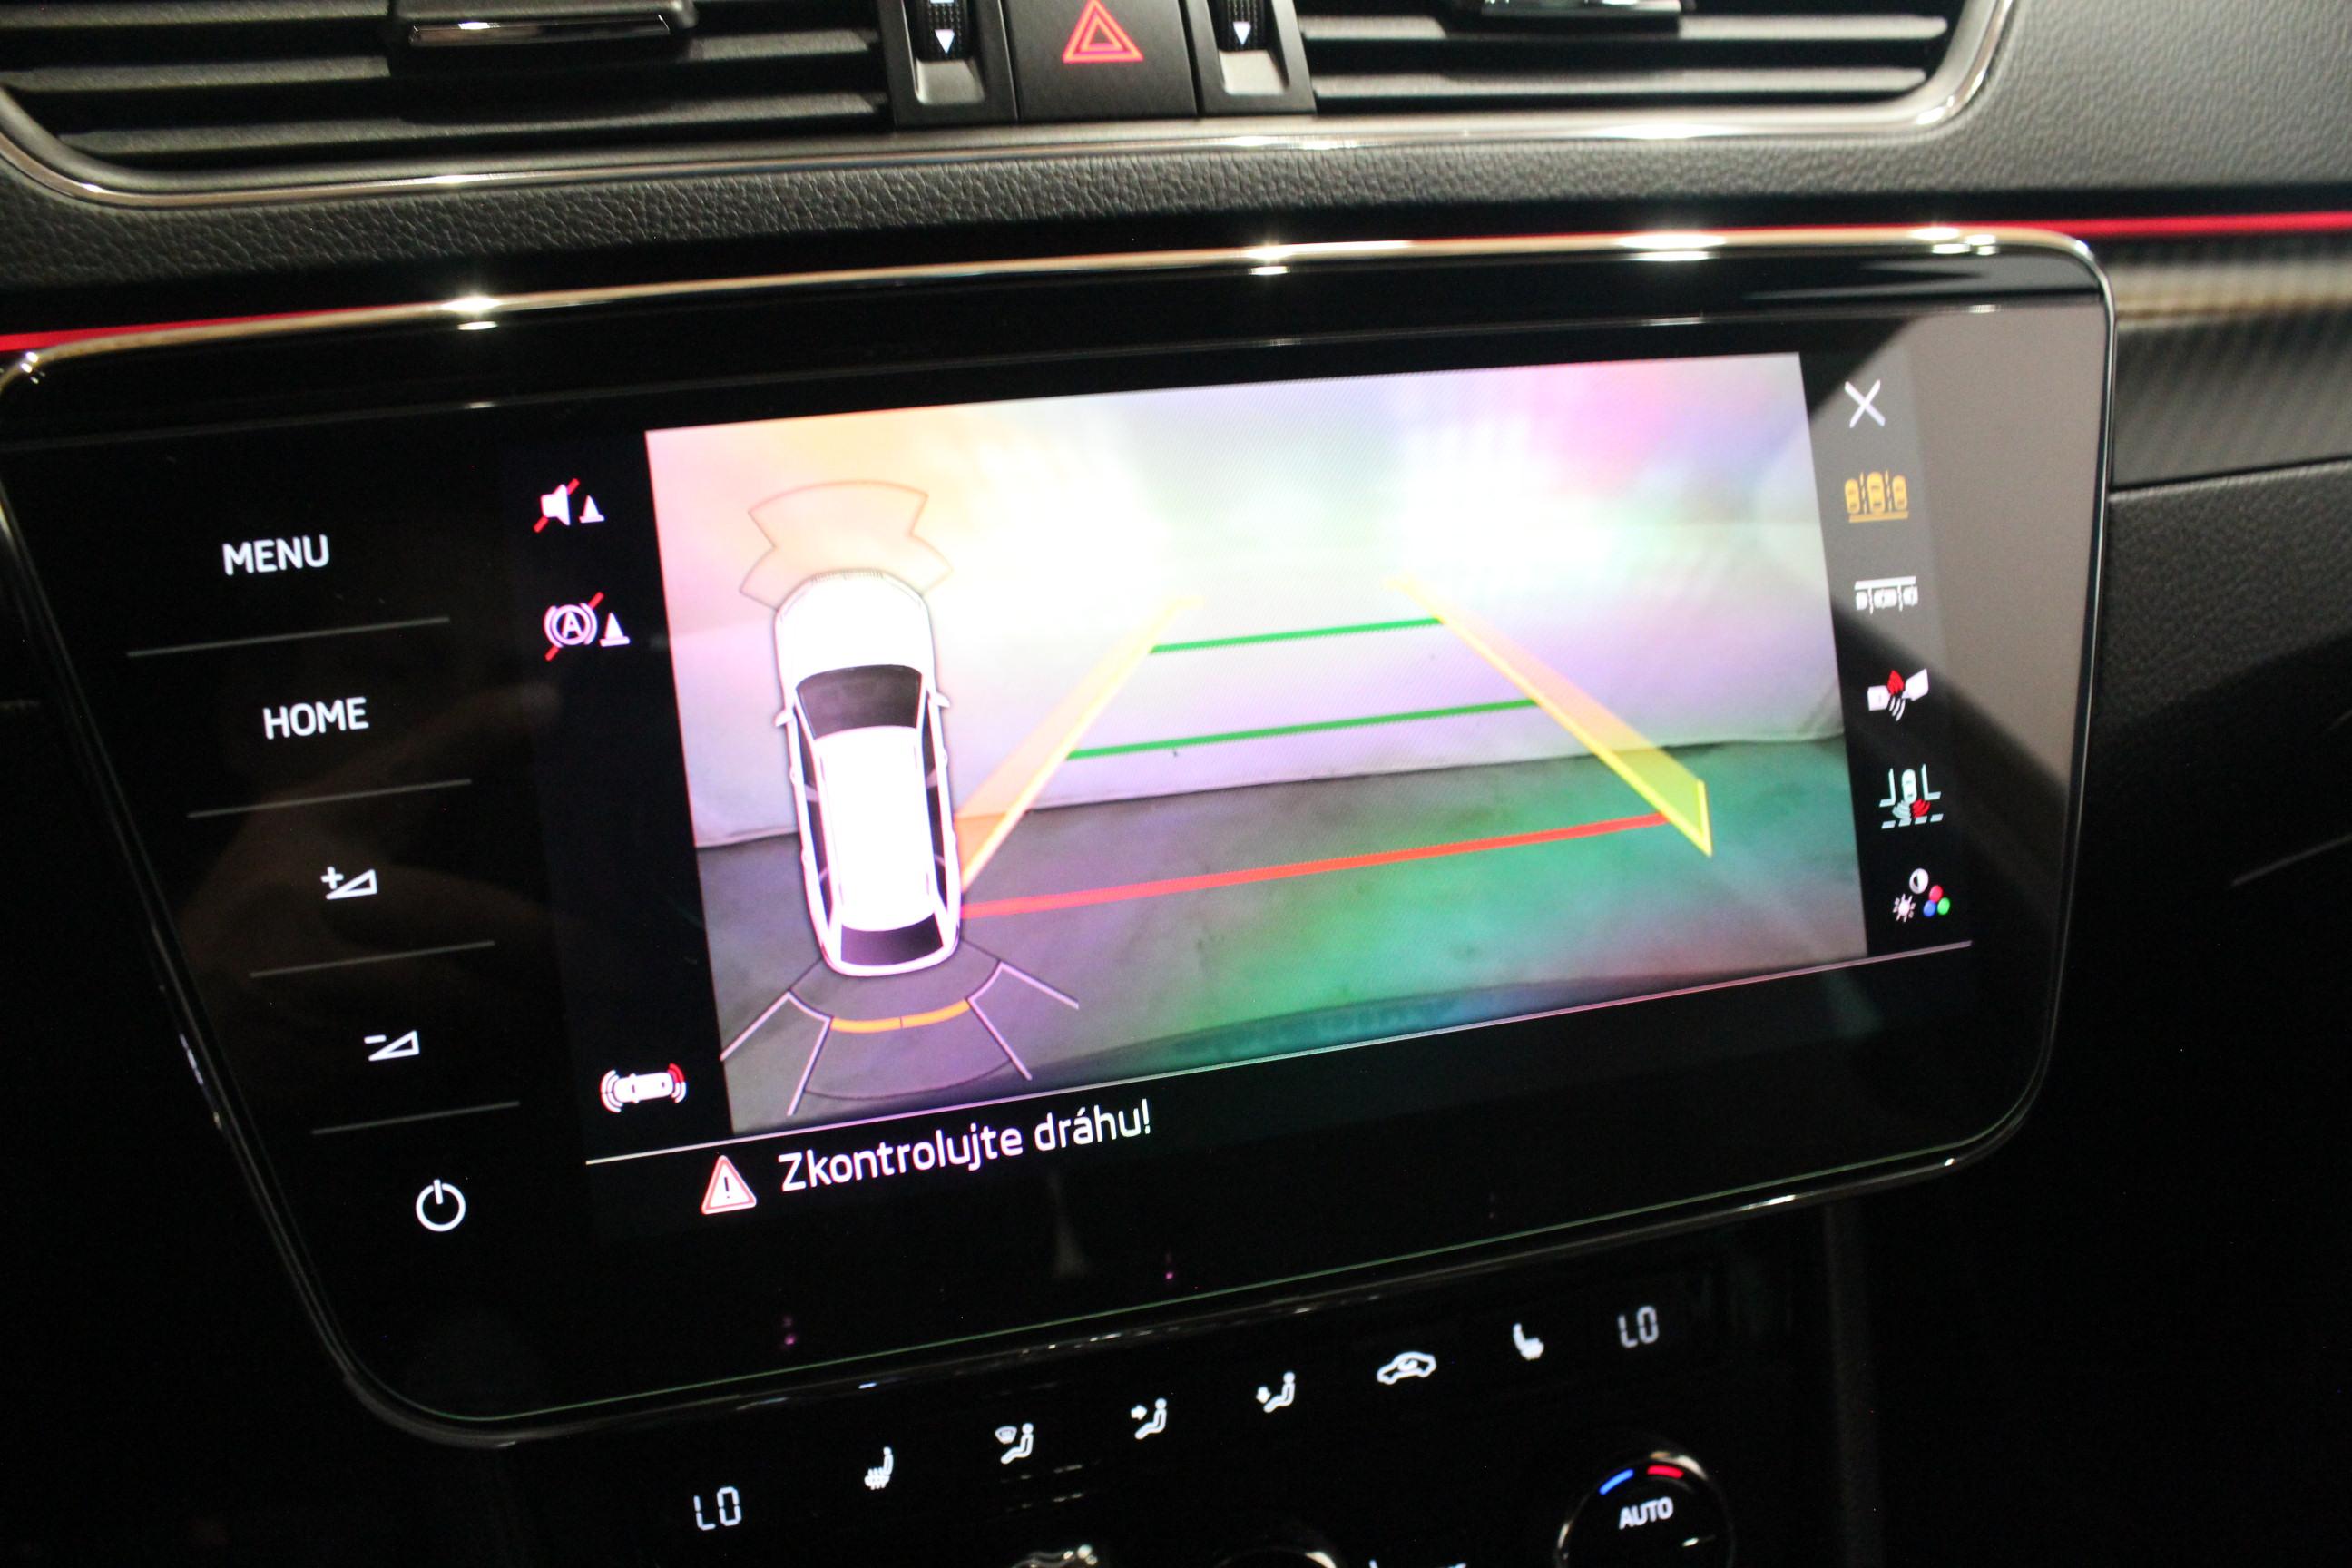 Škoda Superb IV  2.0 TDI DSG 140kW SportLine Active Info display - AutoBrela obrázek